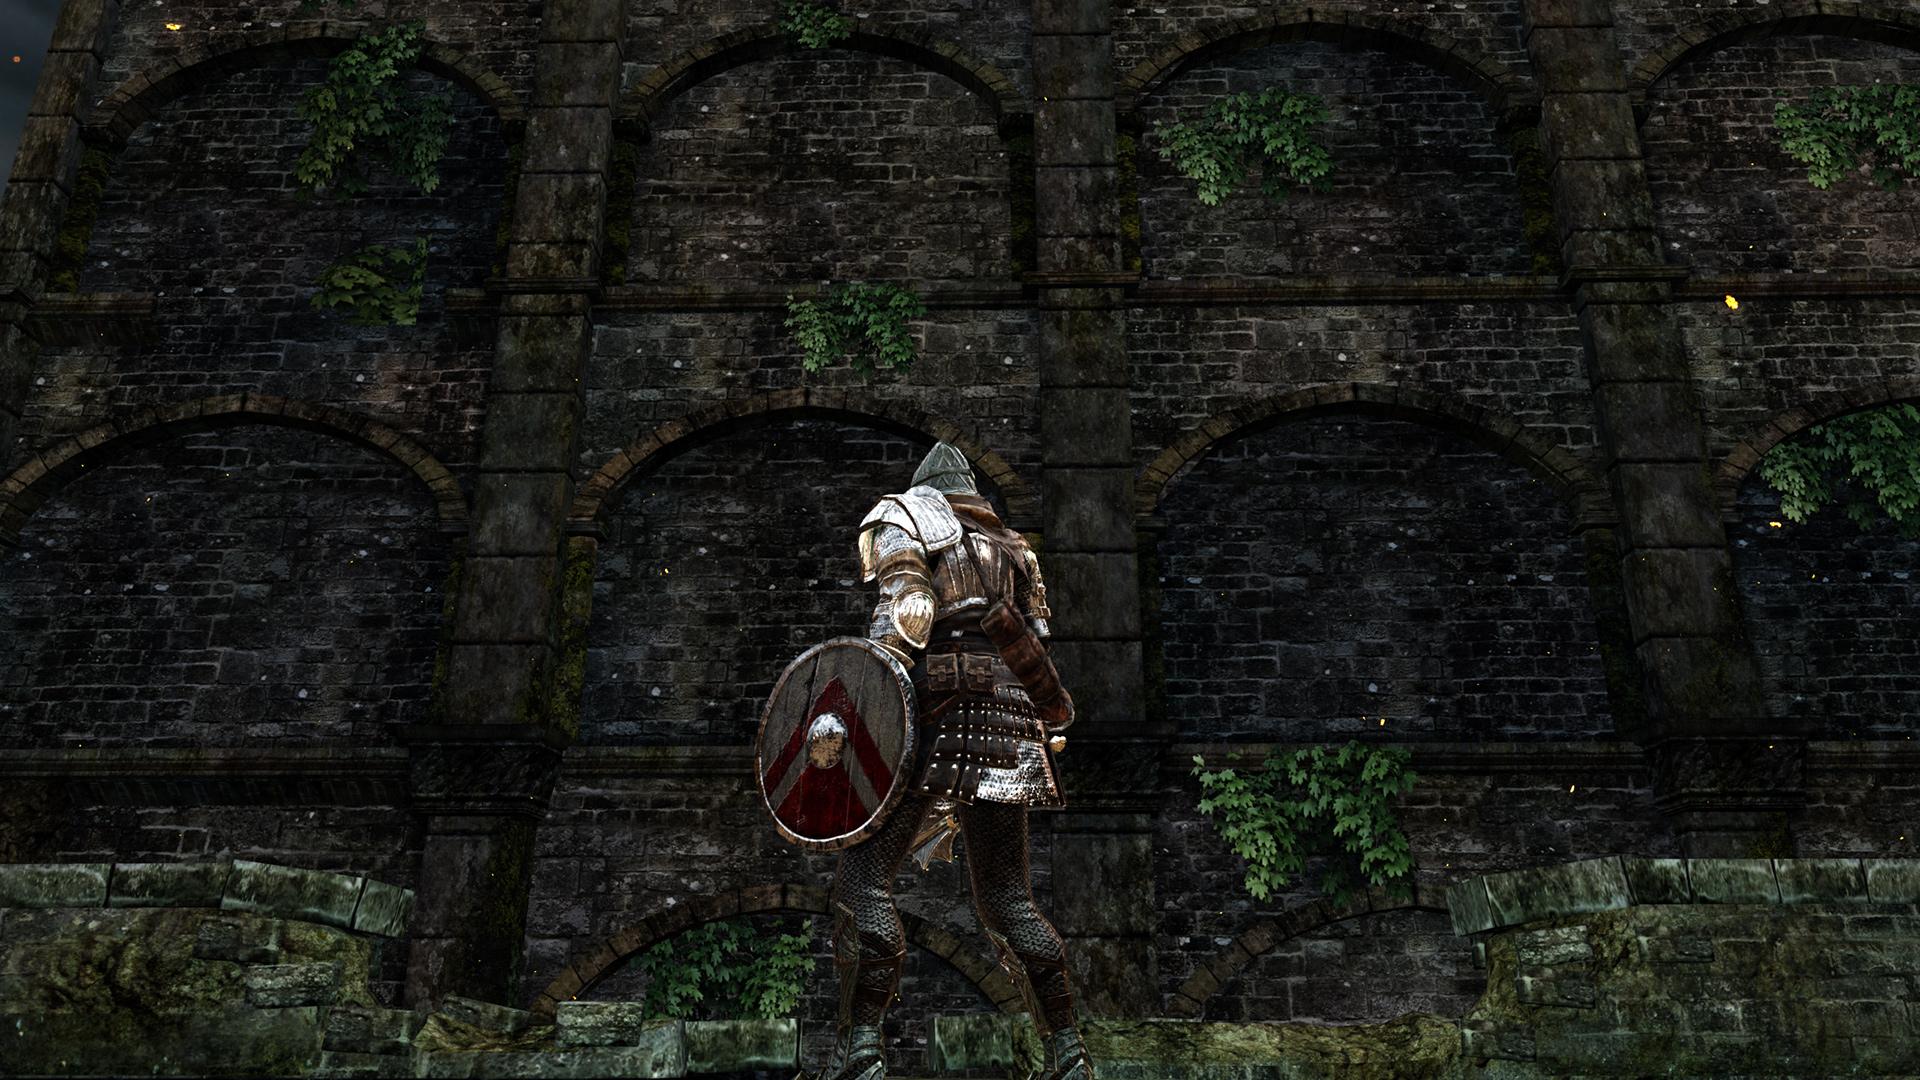 http://abload.de/img/screenshot155444ytygk.jpg